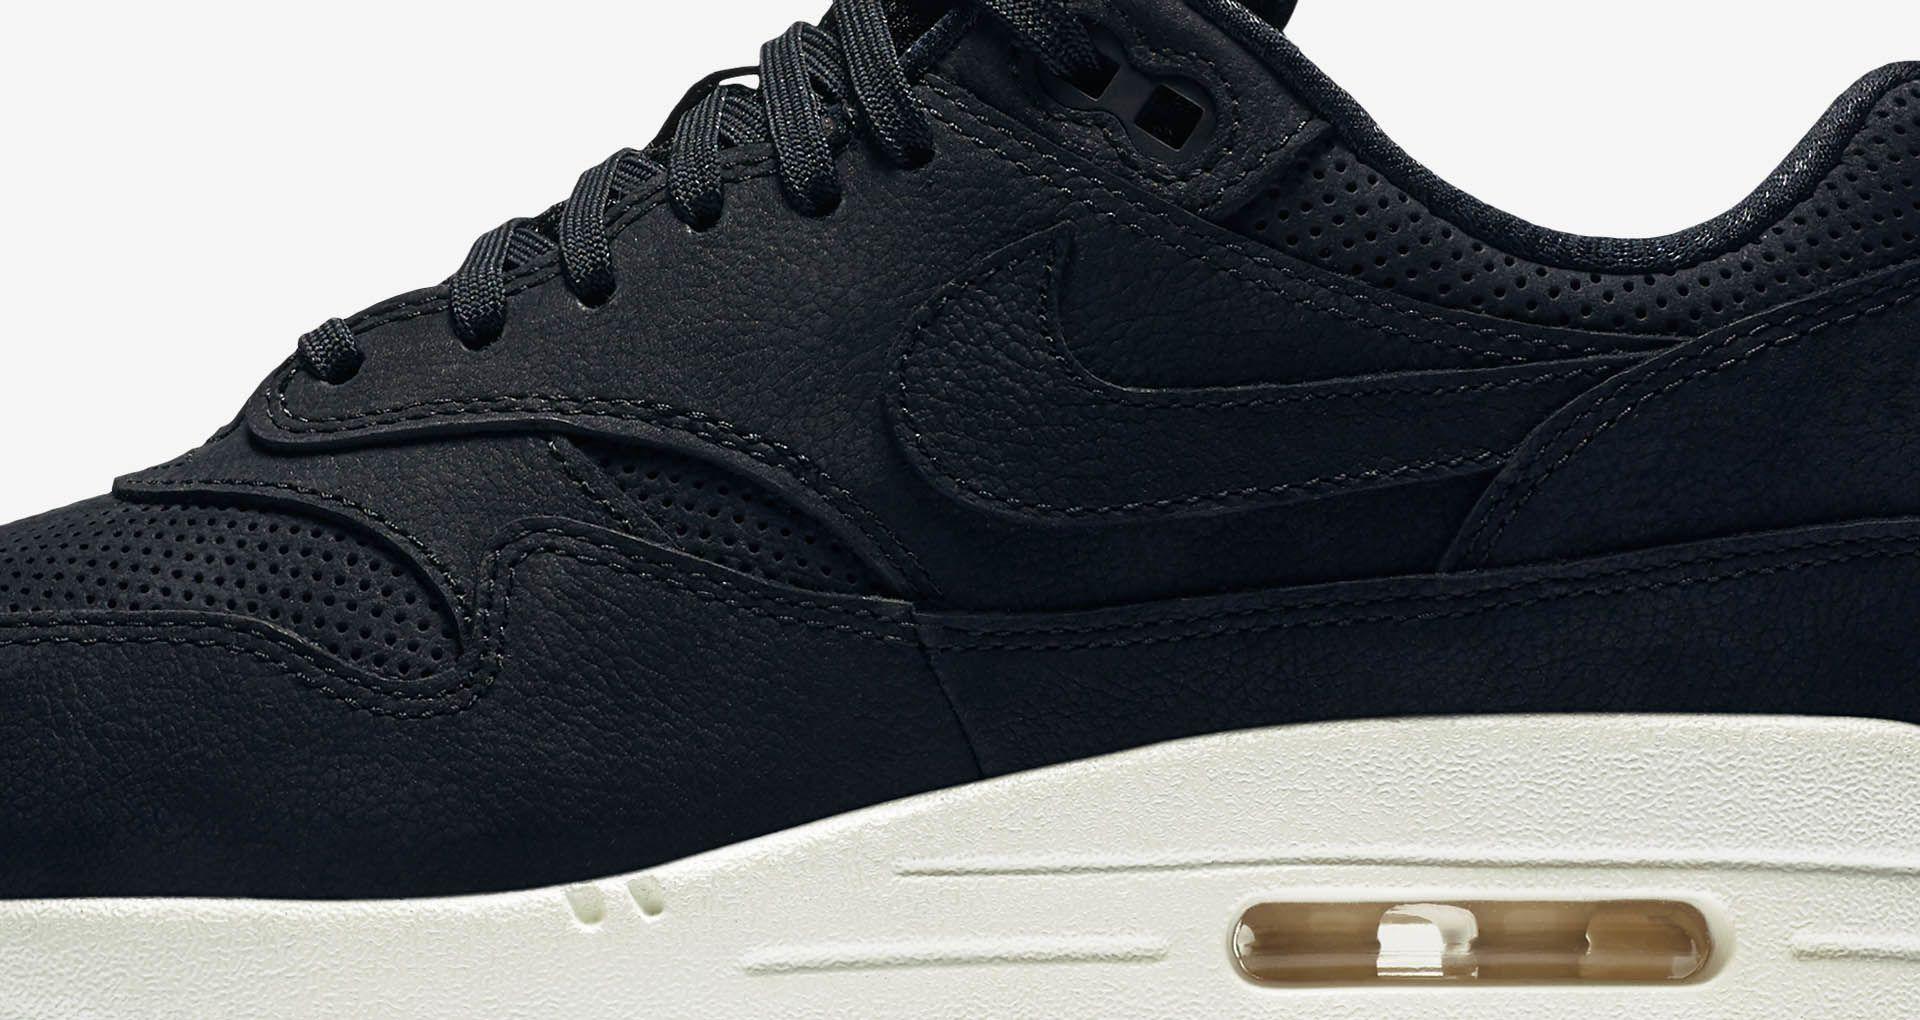 Women's Nike 'black'Nike Air Pinnacle Max 1 HD29WEIY